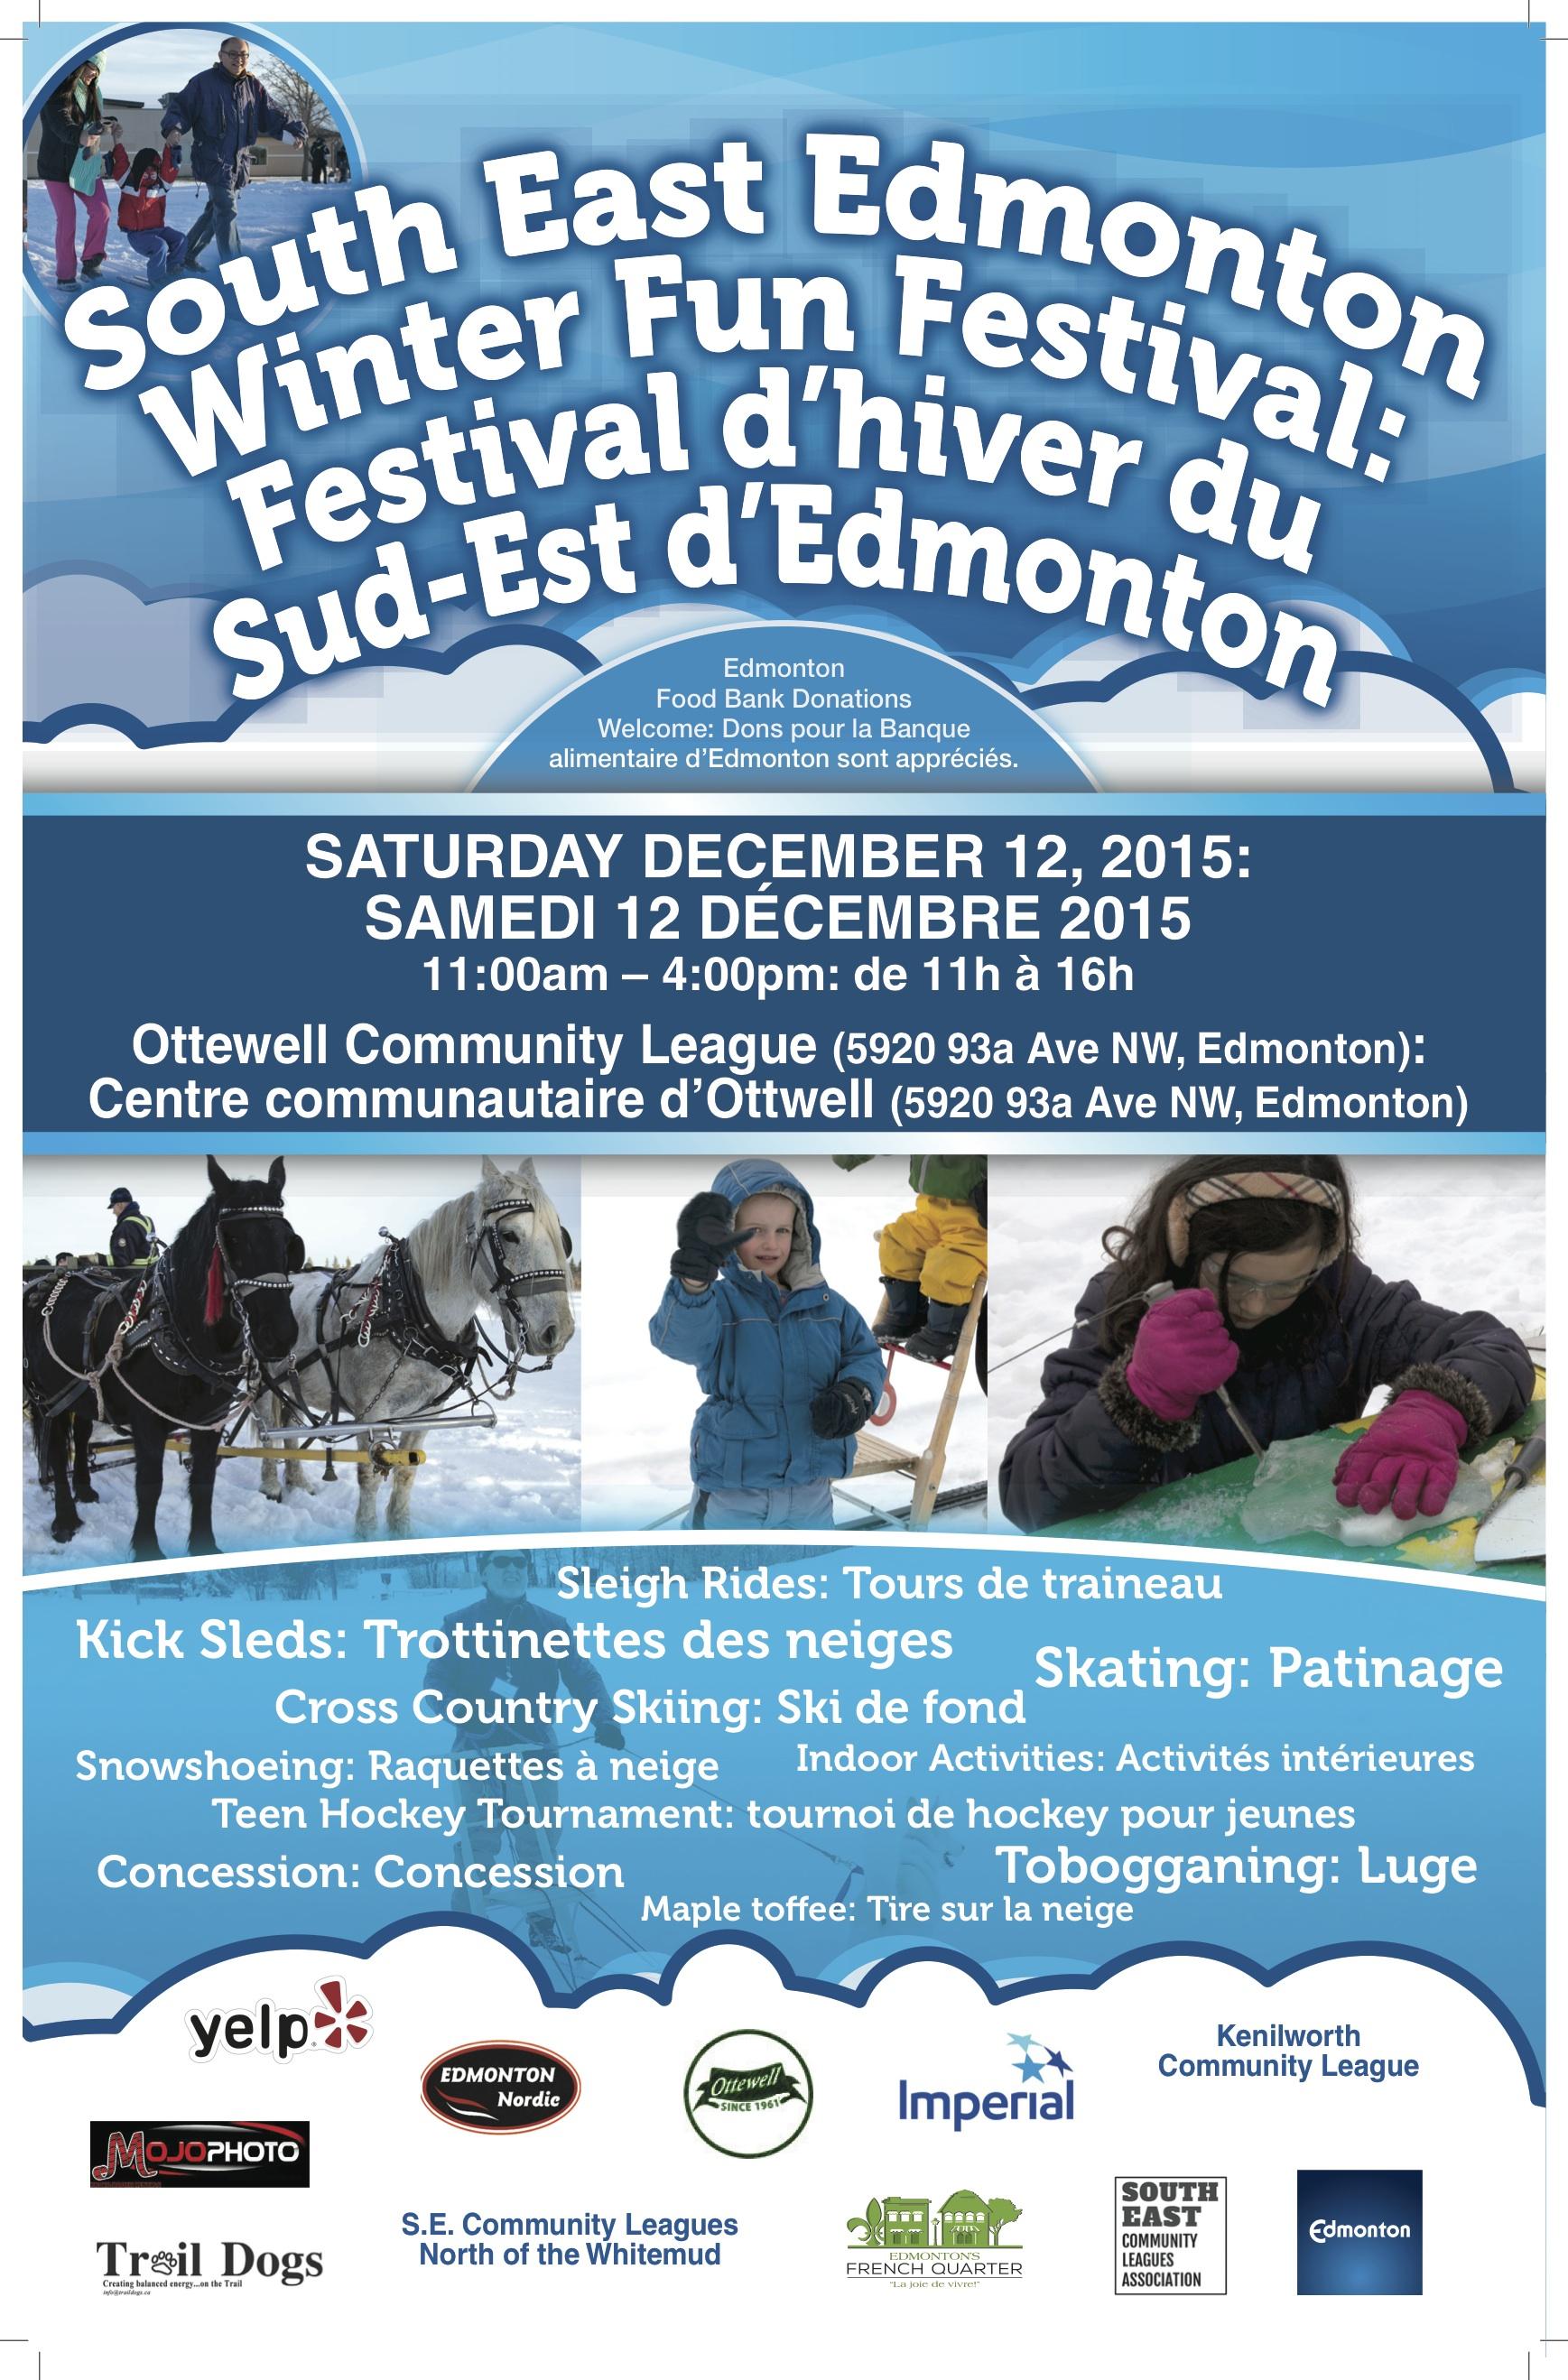 South East Edmonton Winter Fun Festival